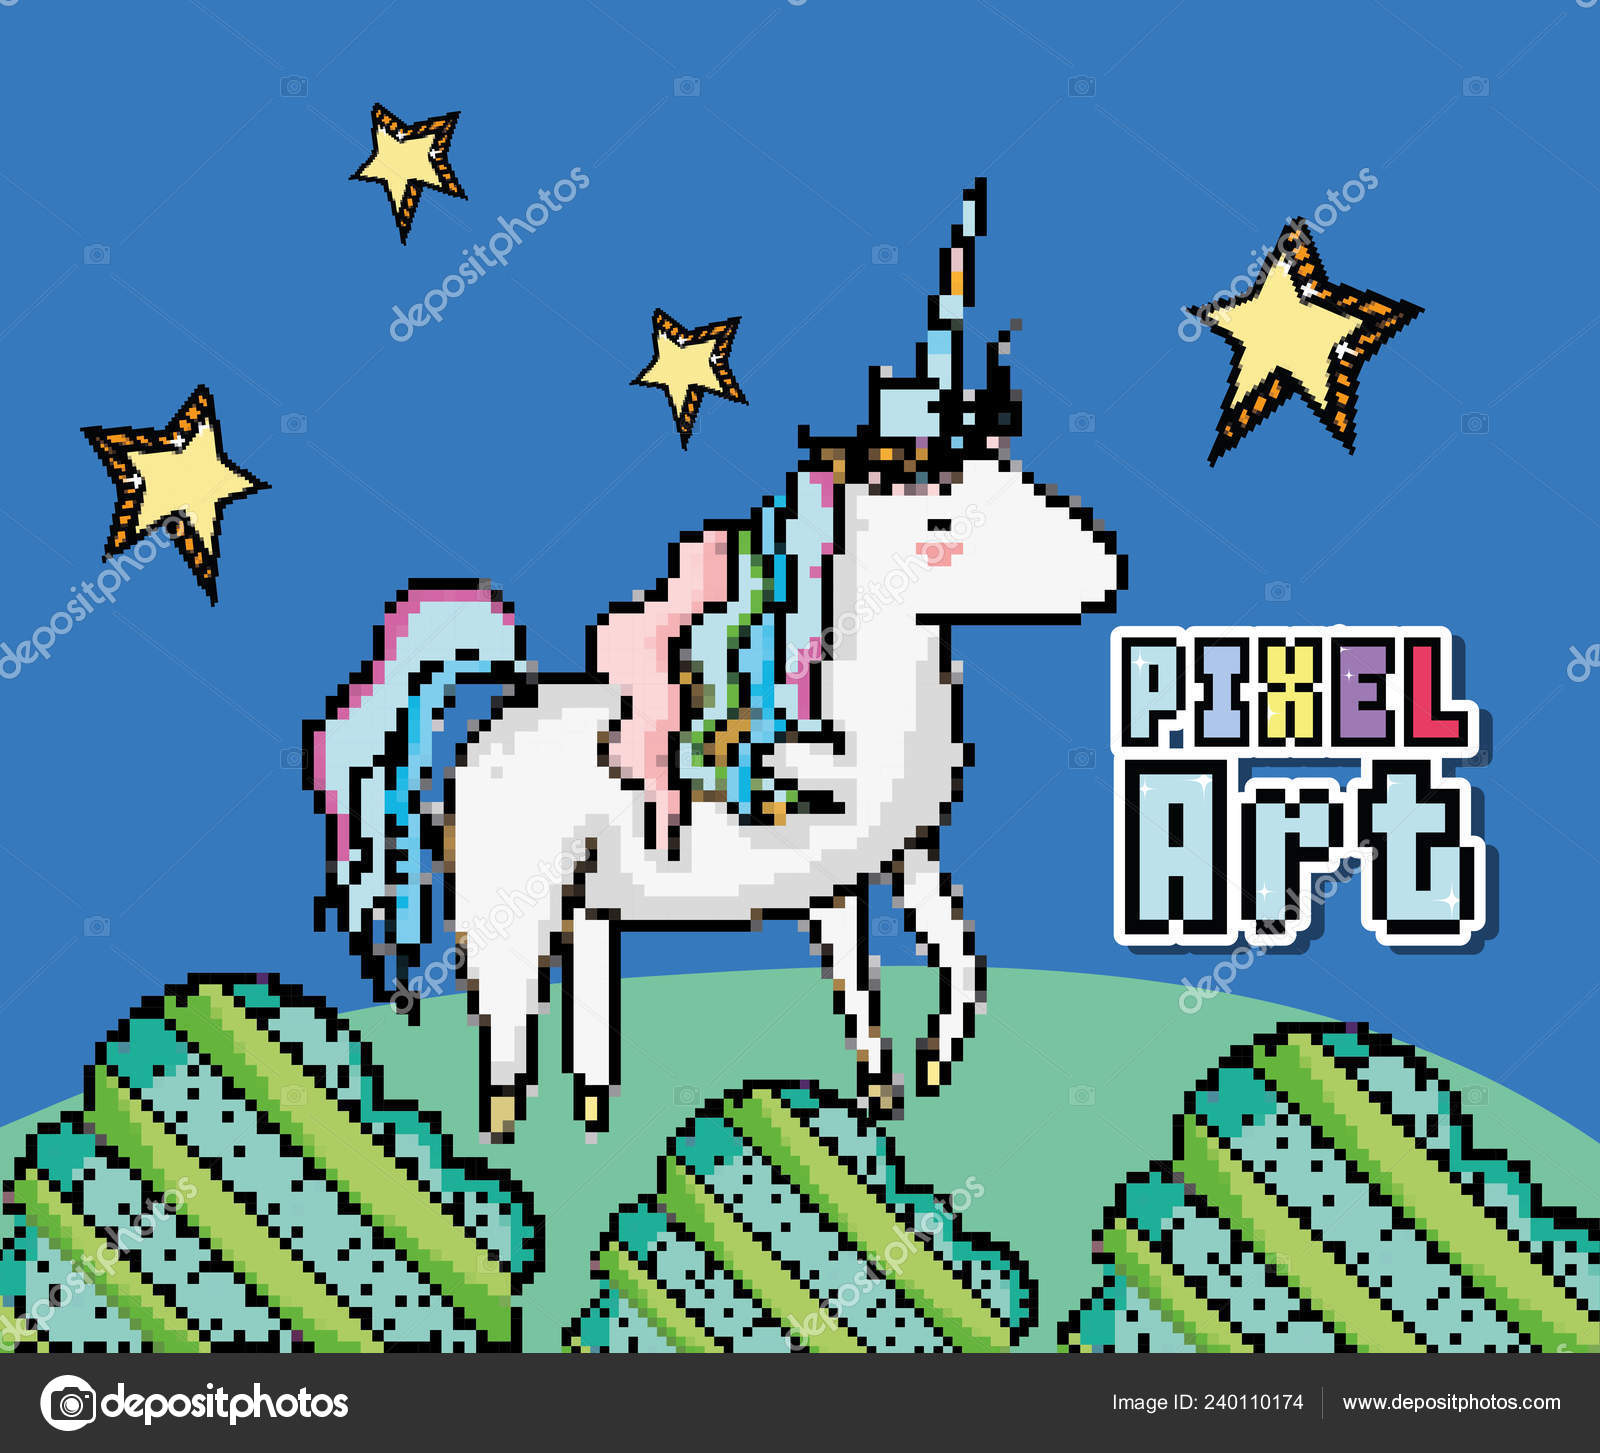 Pixel Art Cute Unicorn Vector Illustration Graphic Design